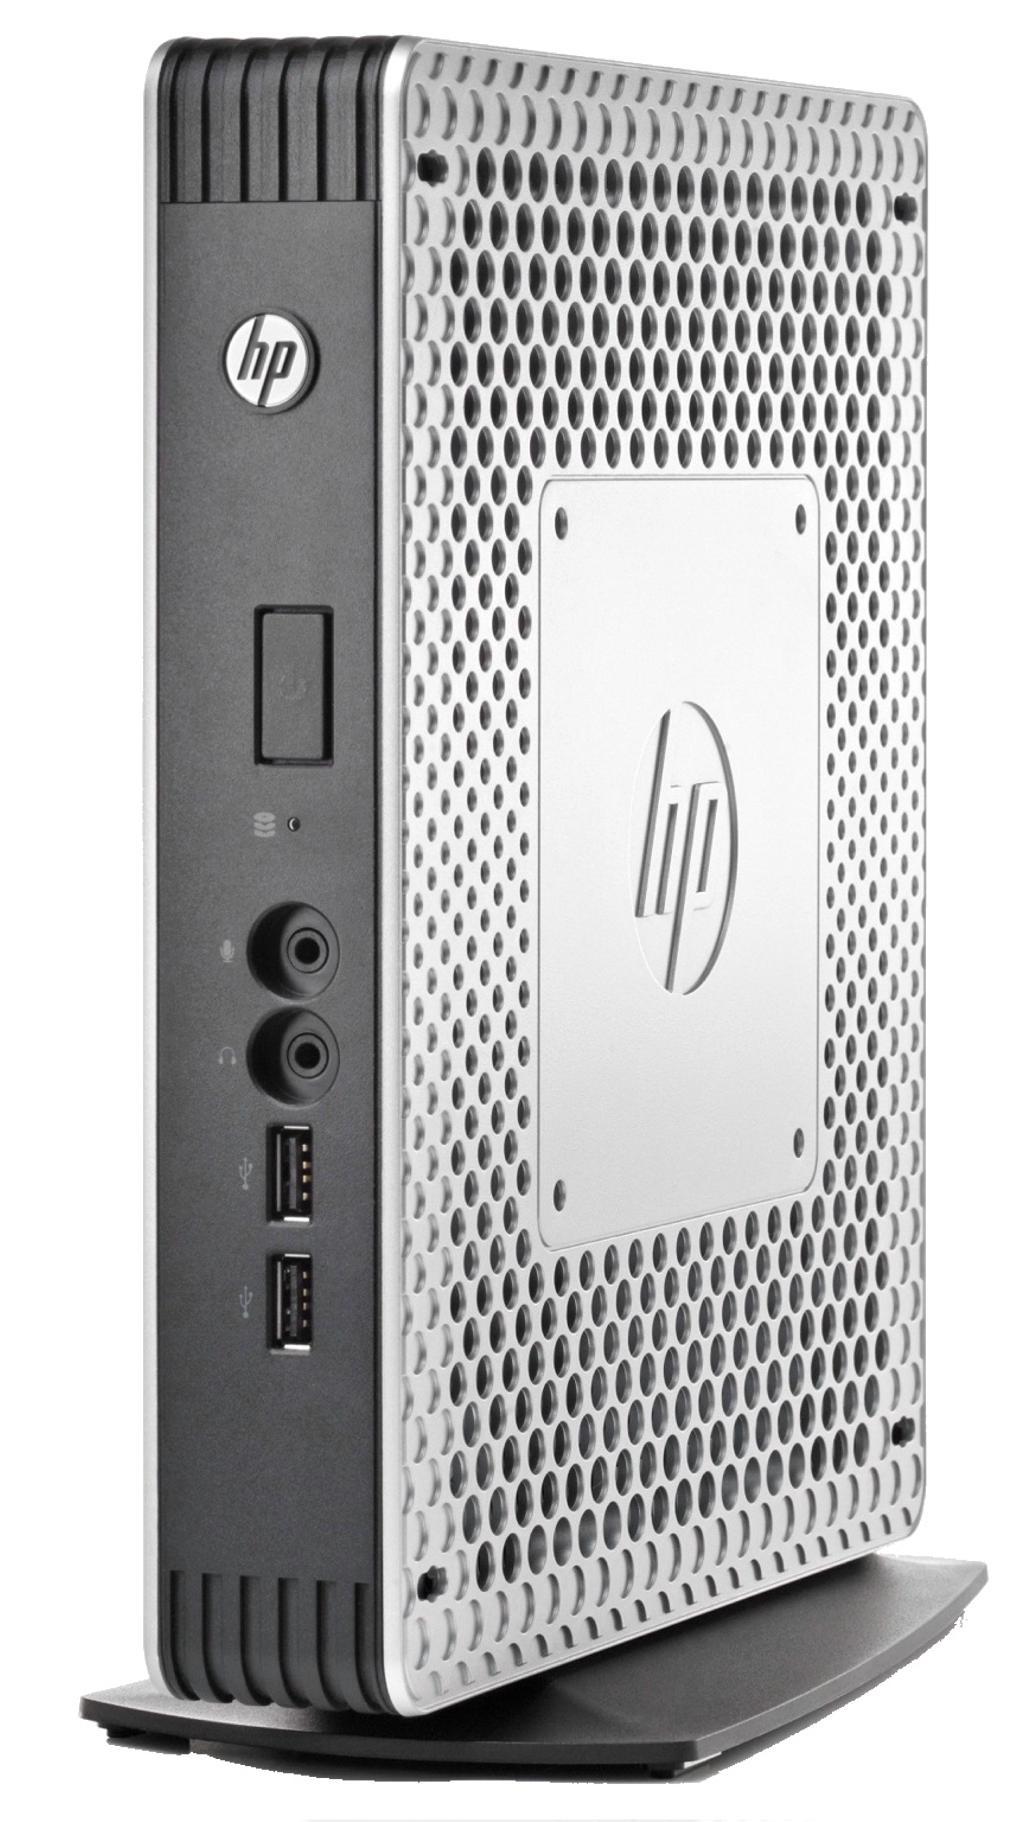 HP t610 Flexible Thin Client Dual Core (T56N) 1.65GHz 2GB 1GB Flash WLAN HP ThinPro (Radeon HD 6320) Energy Star